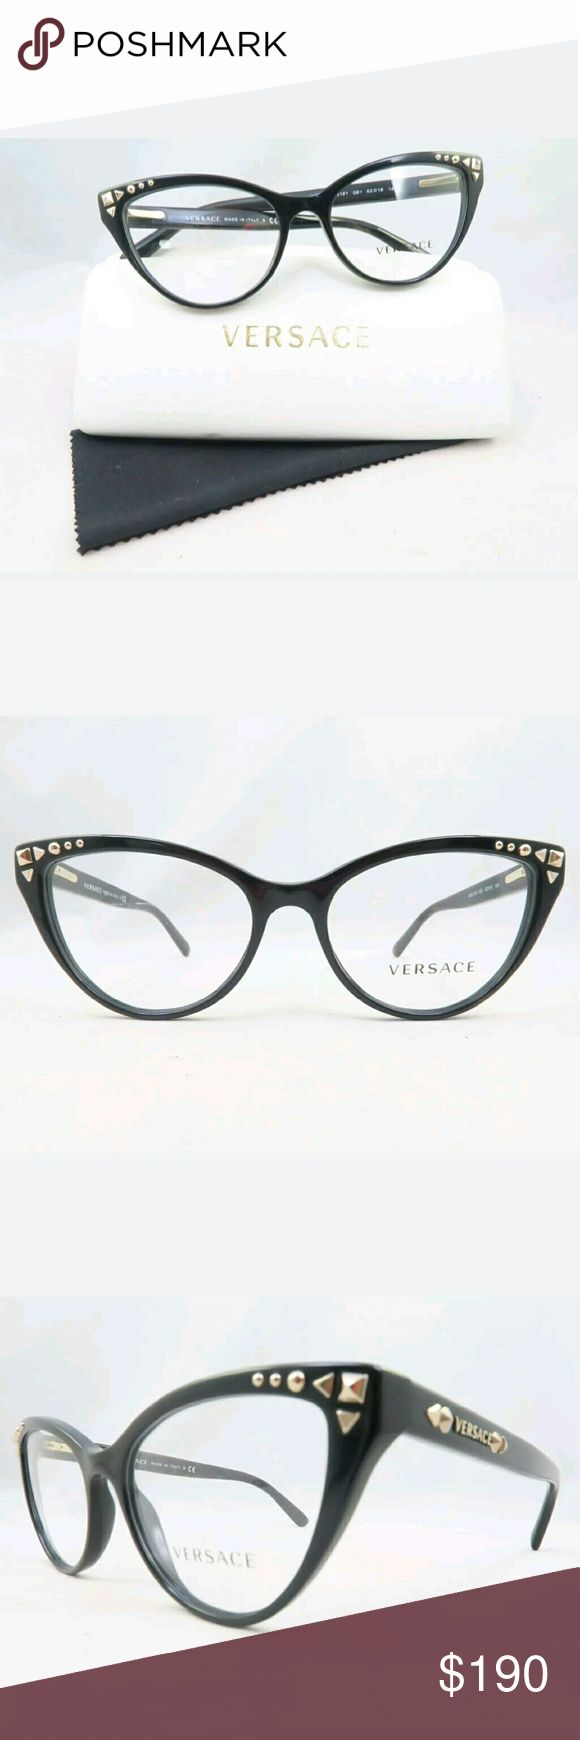 Versace Eyeglasses Authentic and new  Versace Eyeglasses  Black frame  52-16-140  Includes original case Versace Accessories Glasses